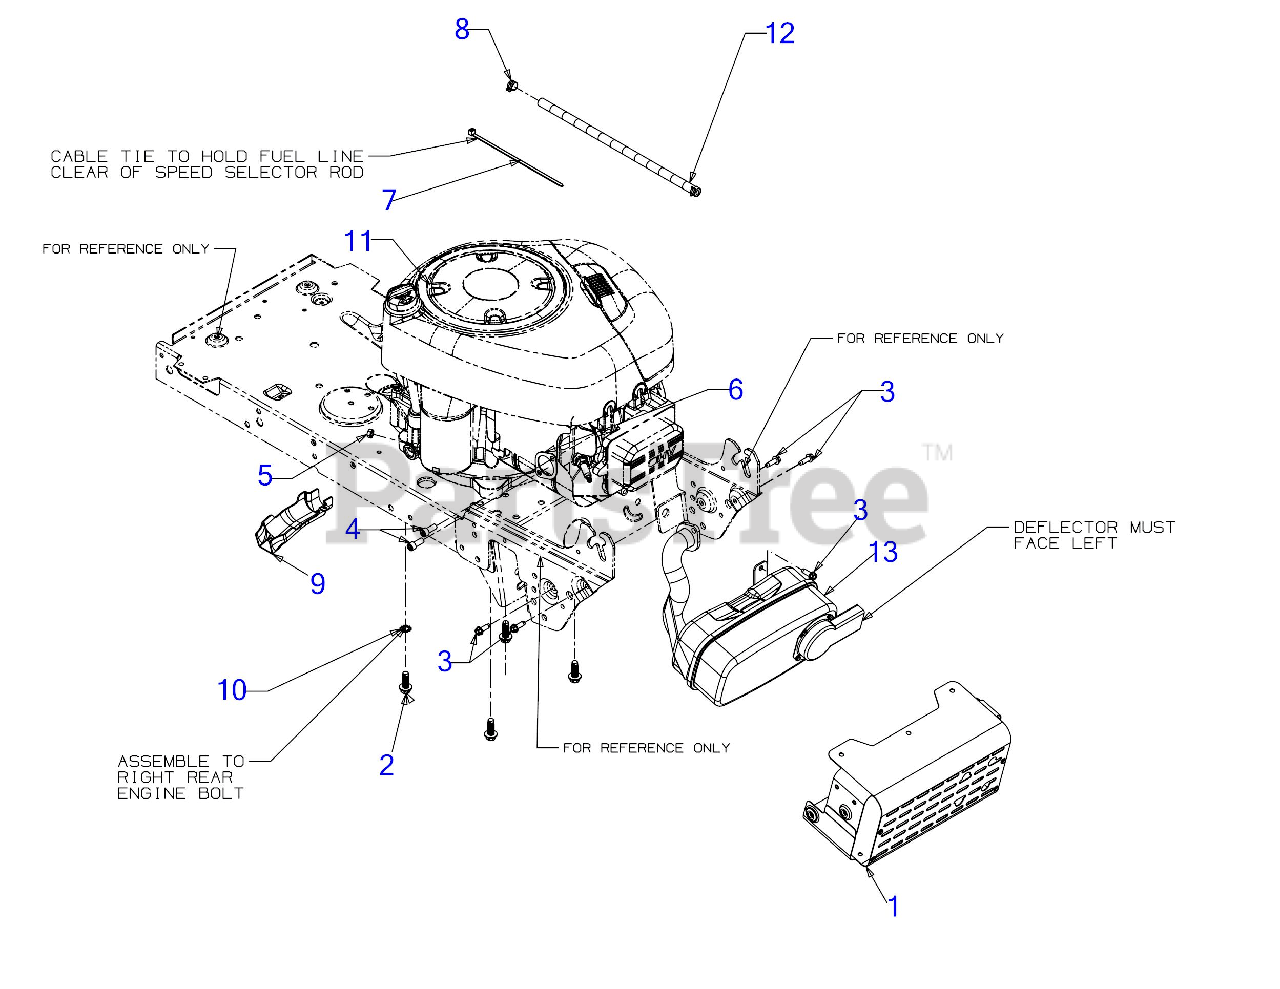 Craftsman 247 13bl78xt099